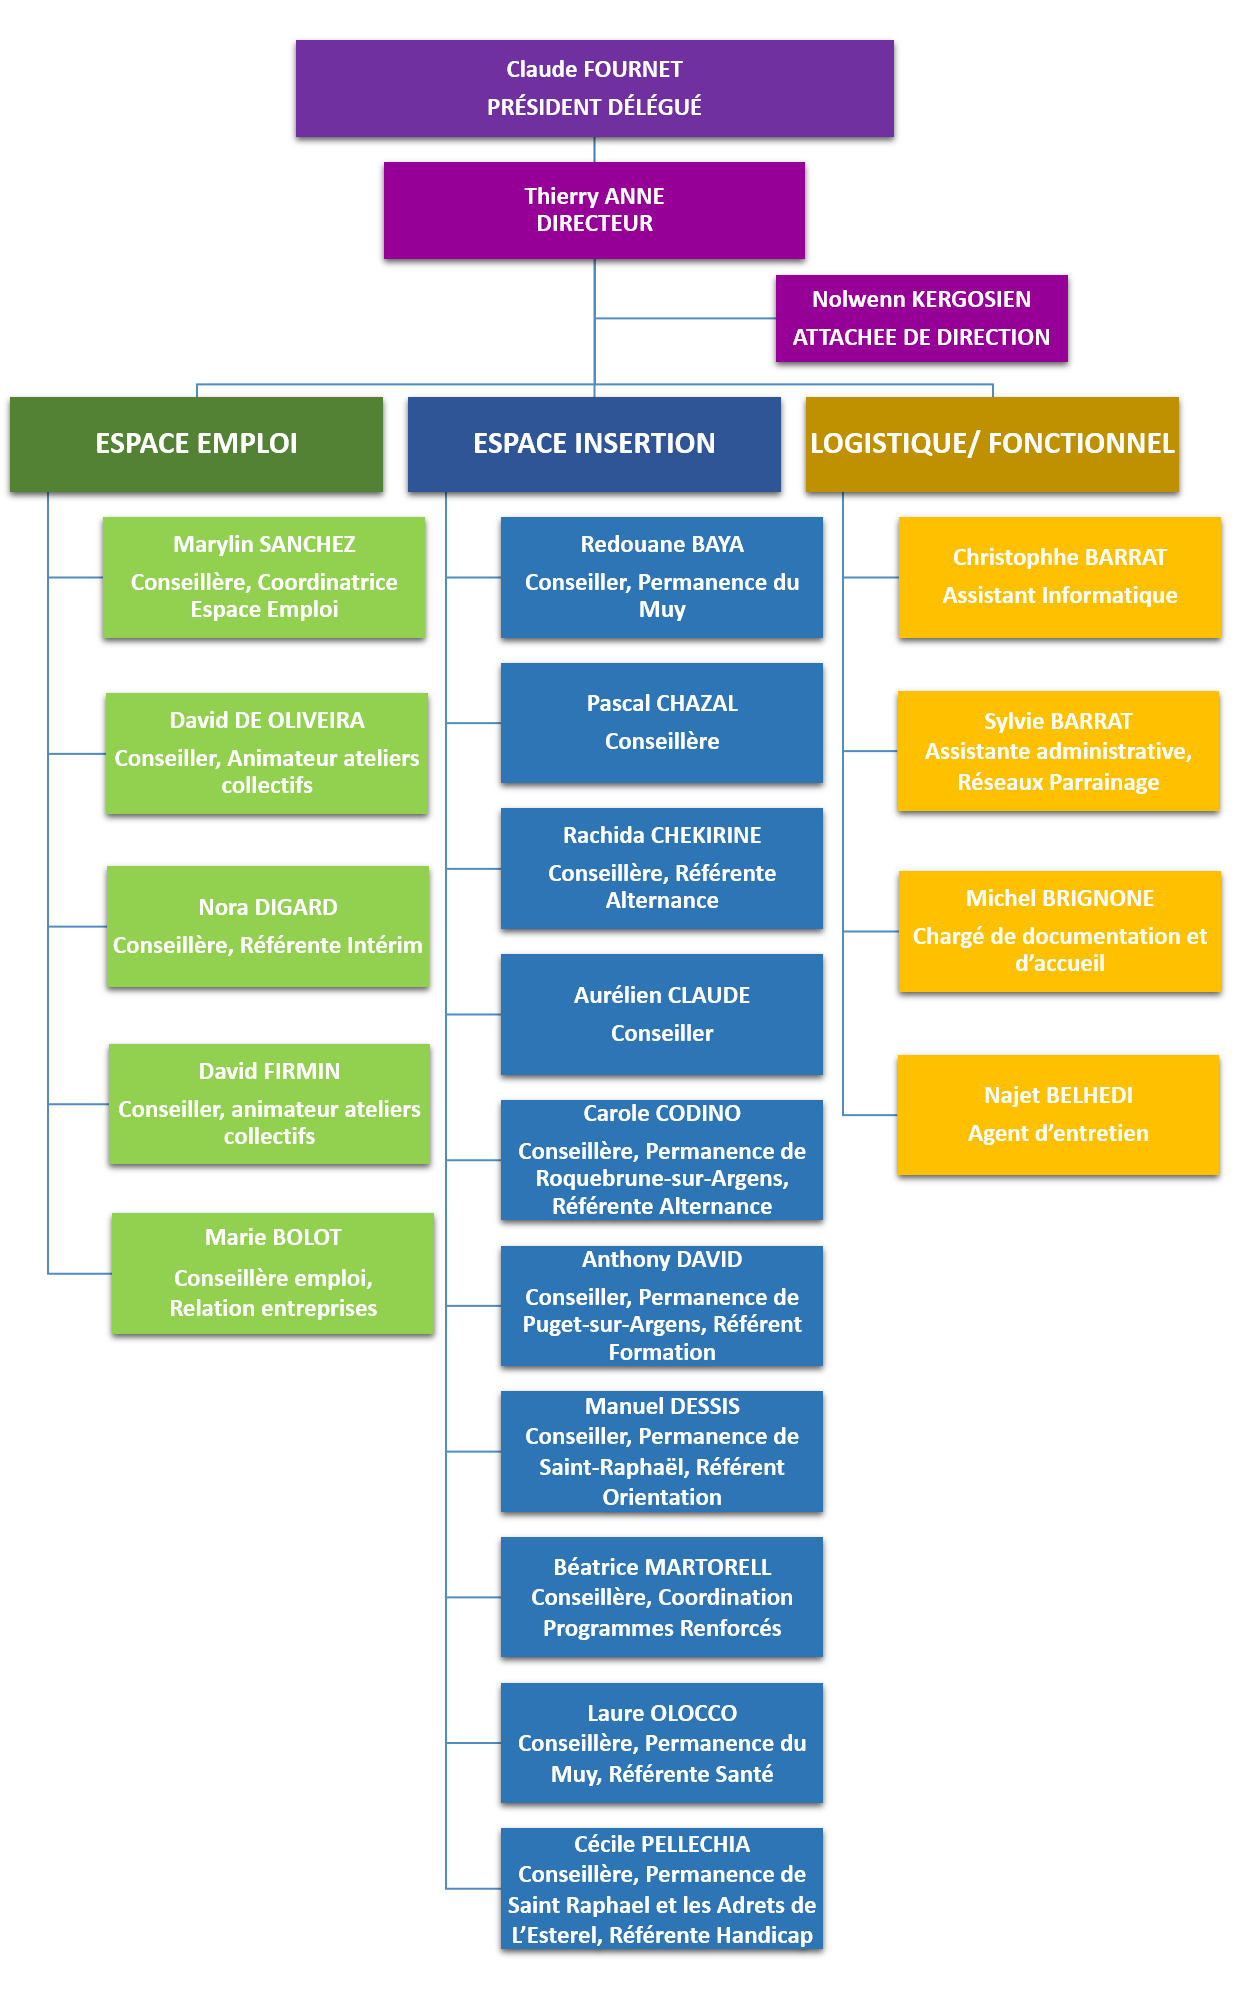 organigramme hierarchique